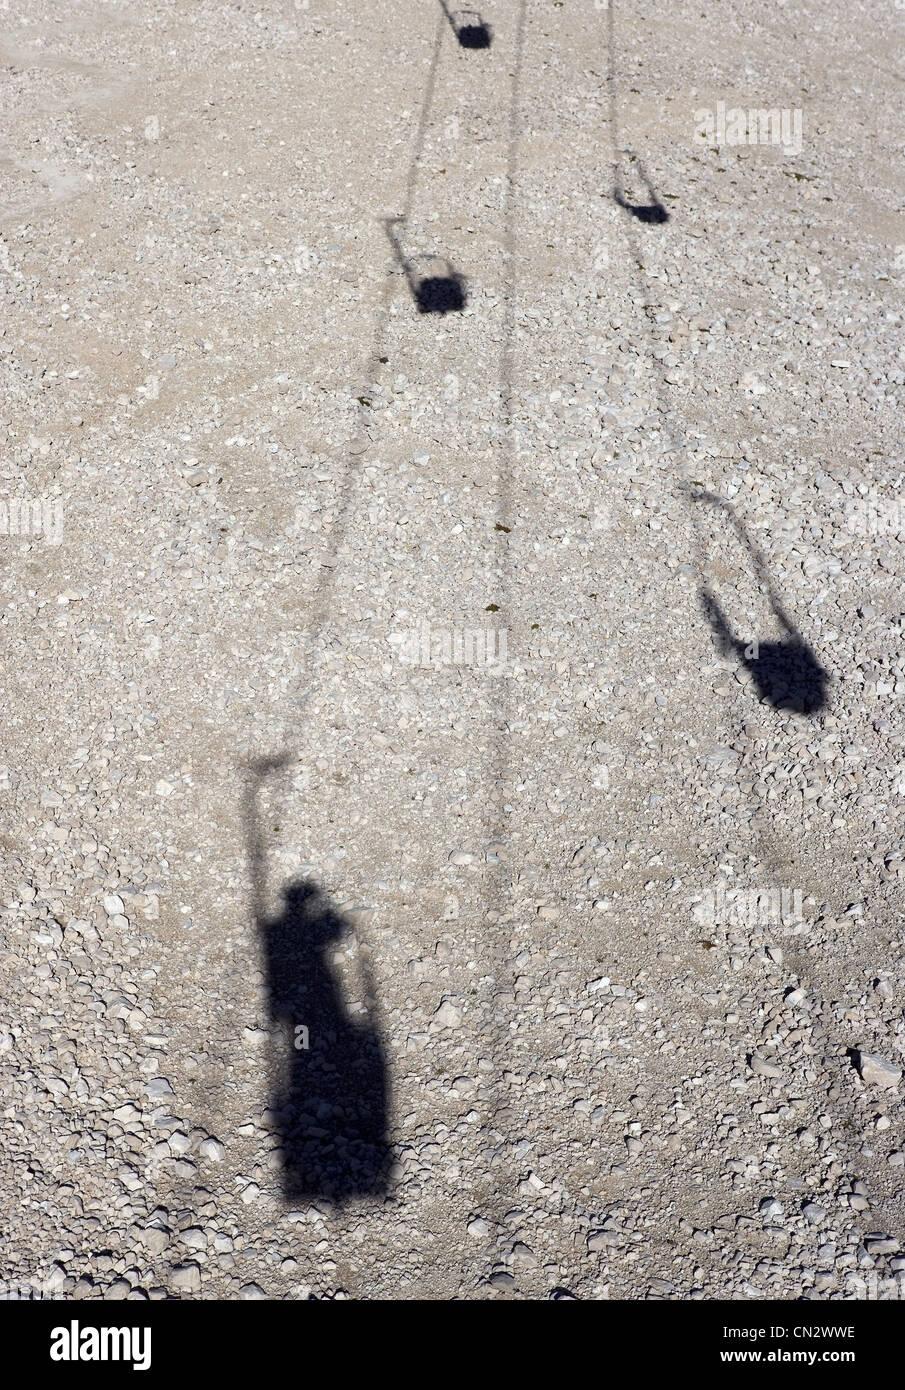 Cable car shadows, Dolomites, Alto Adige, Italy - Stock Image